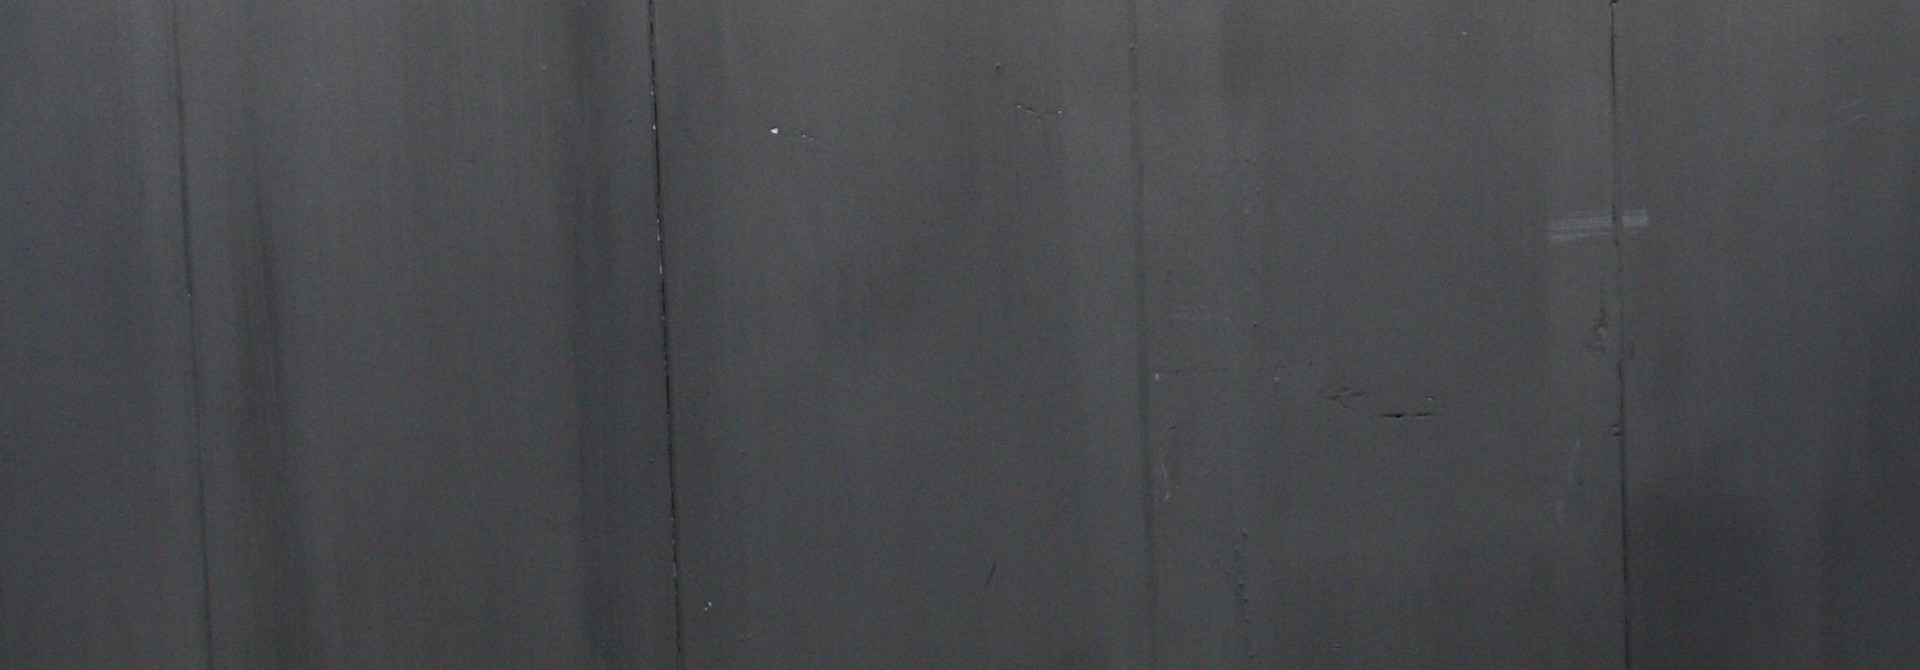 PTMD Bloemenvaas set Lichtblauw